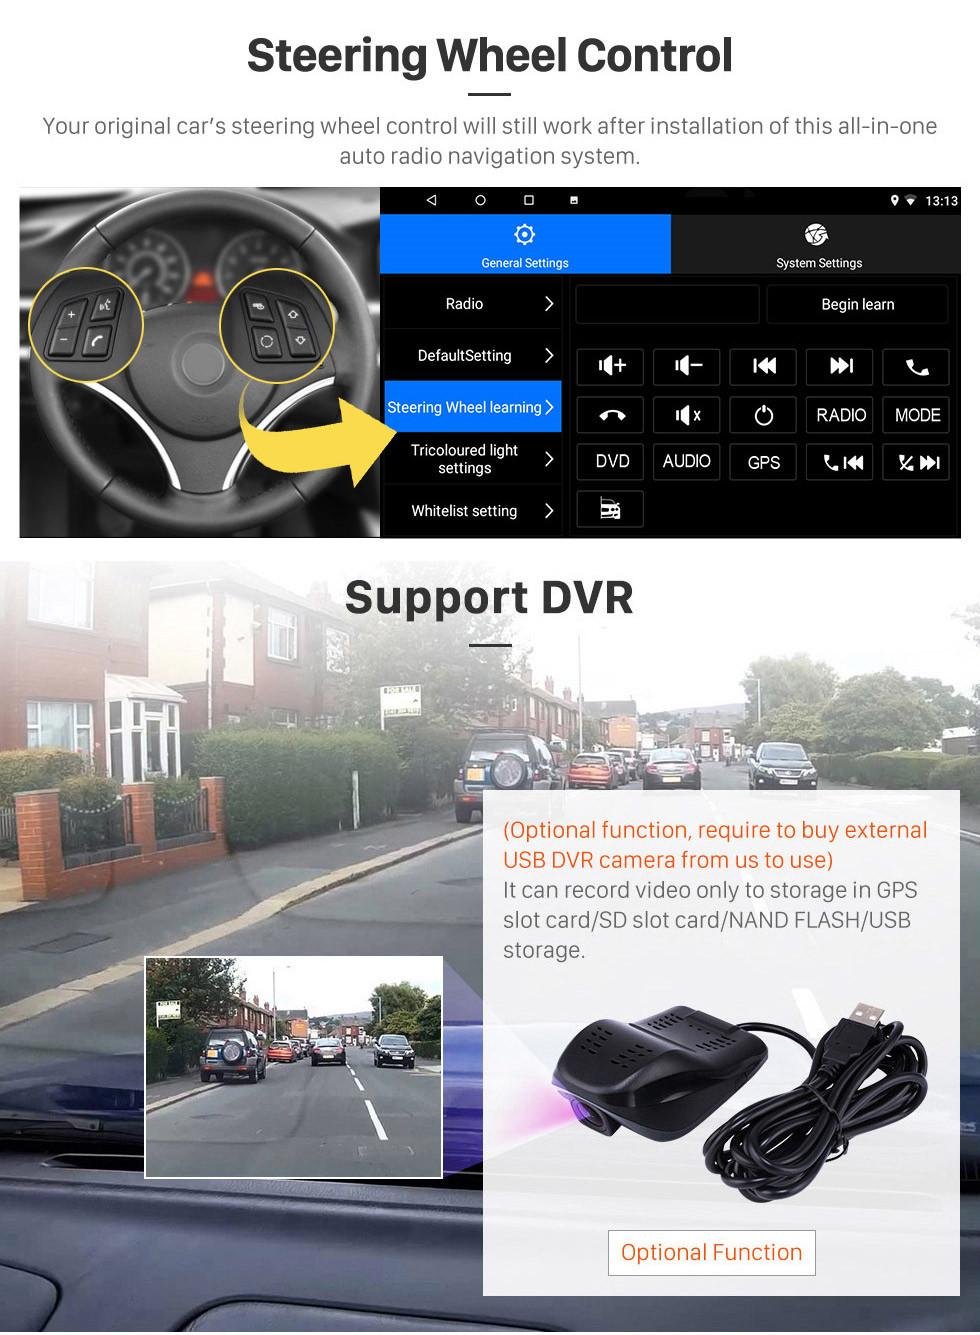 Seicane 10,1 zoll Android 10.0 2014 2015 2016 2017 Kia KX3 GPS Navigationsradio mit Bluetooth HD Touchscreen WIFI Musik unterstützung TPMS DVR Carplay Digital TV